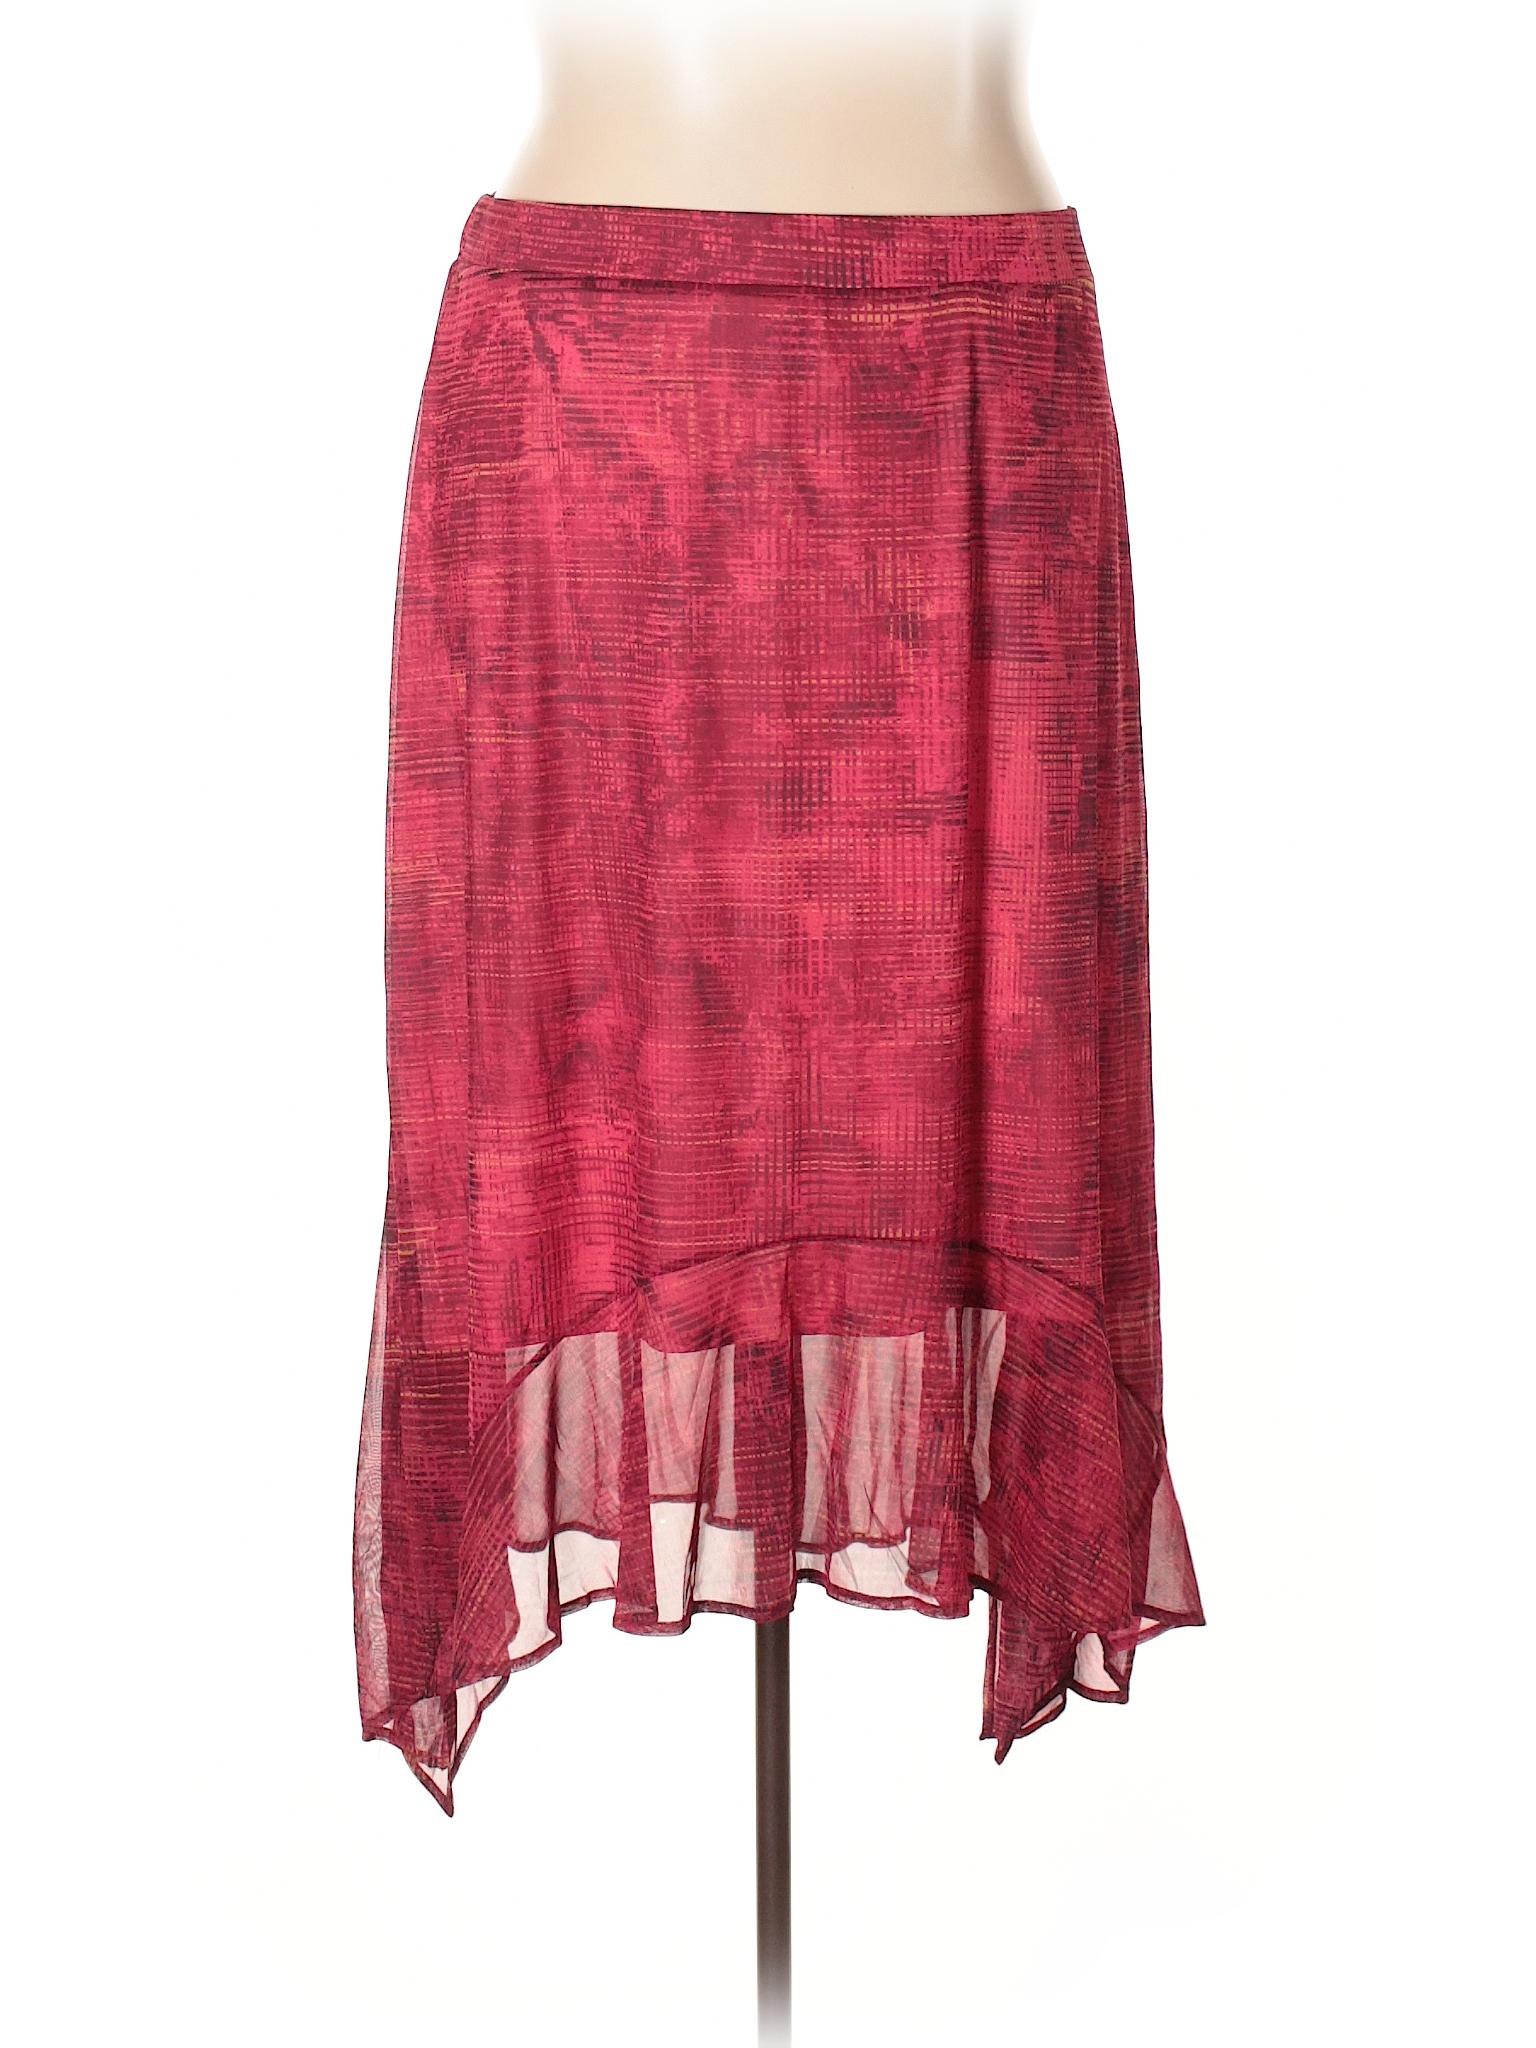 Skirt Boutique Casual Casual Casual Skirt Boutique Skirt Boutique Boutique 1x8wvZOqFA